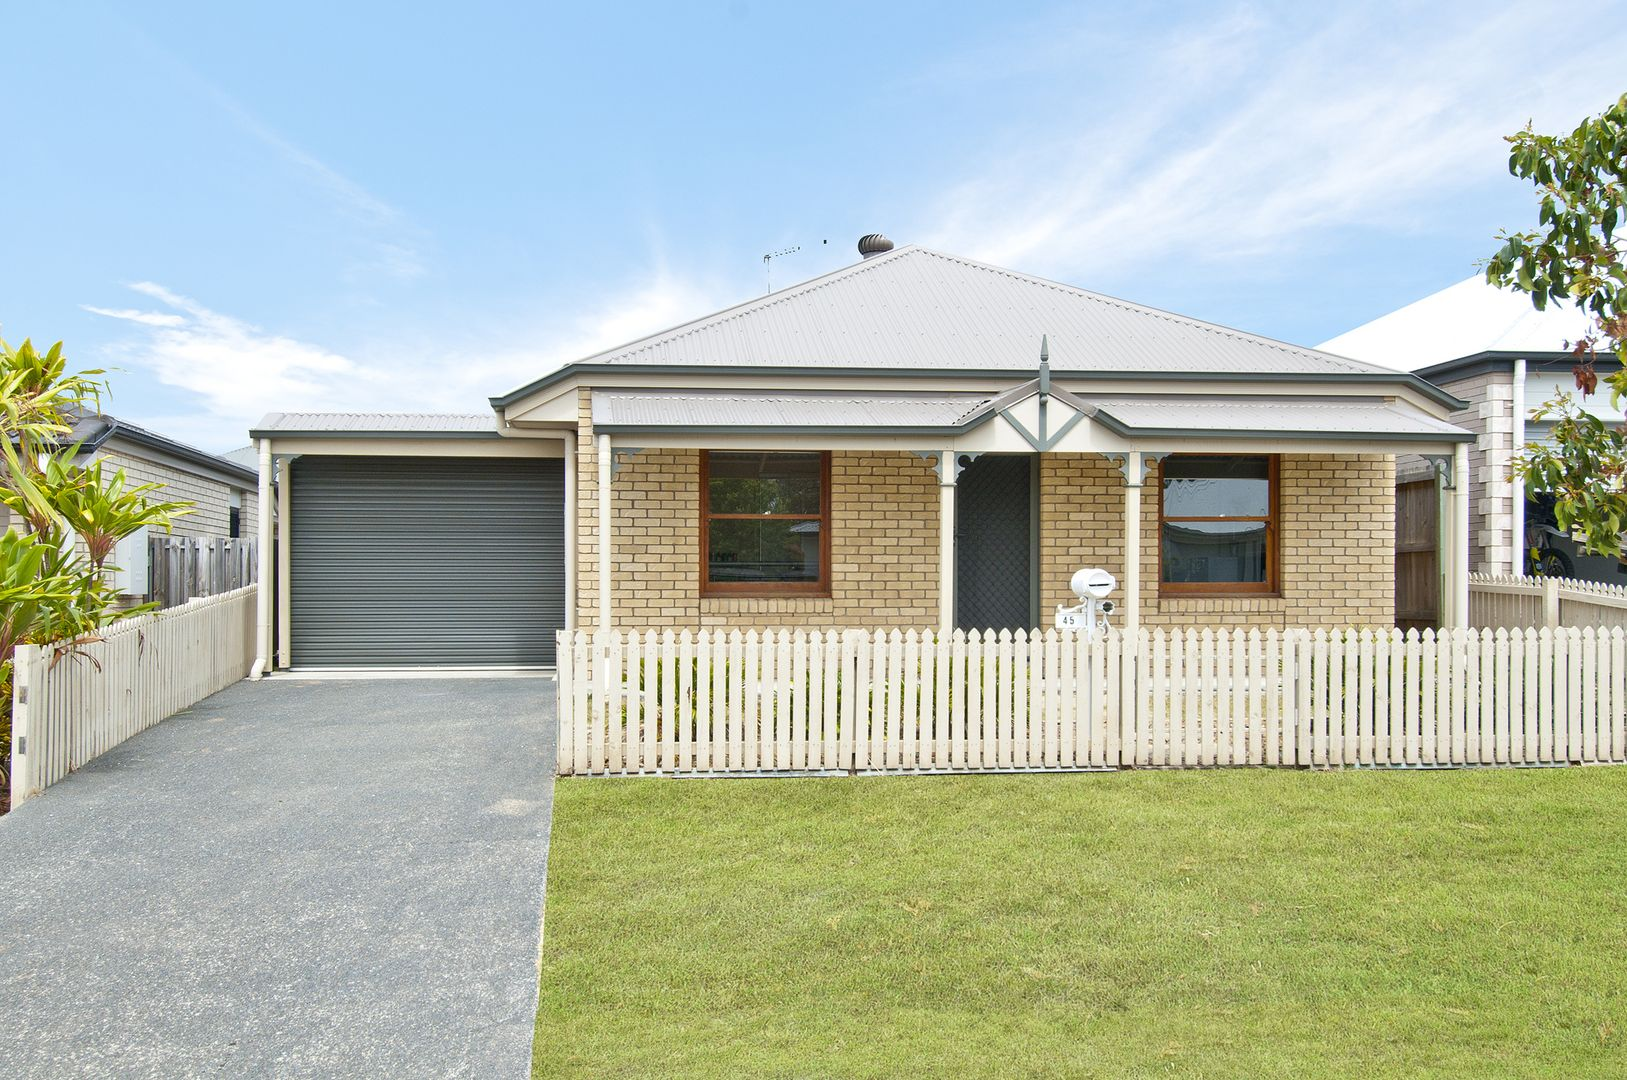 45 Carew Street, Yarrabilba QLD 4207, Image 0